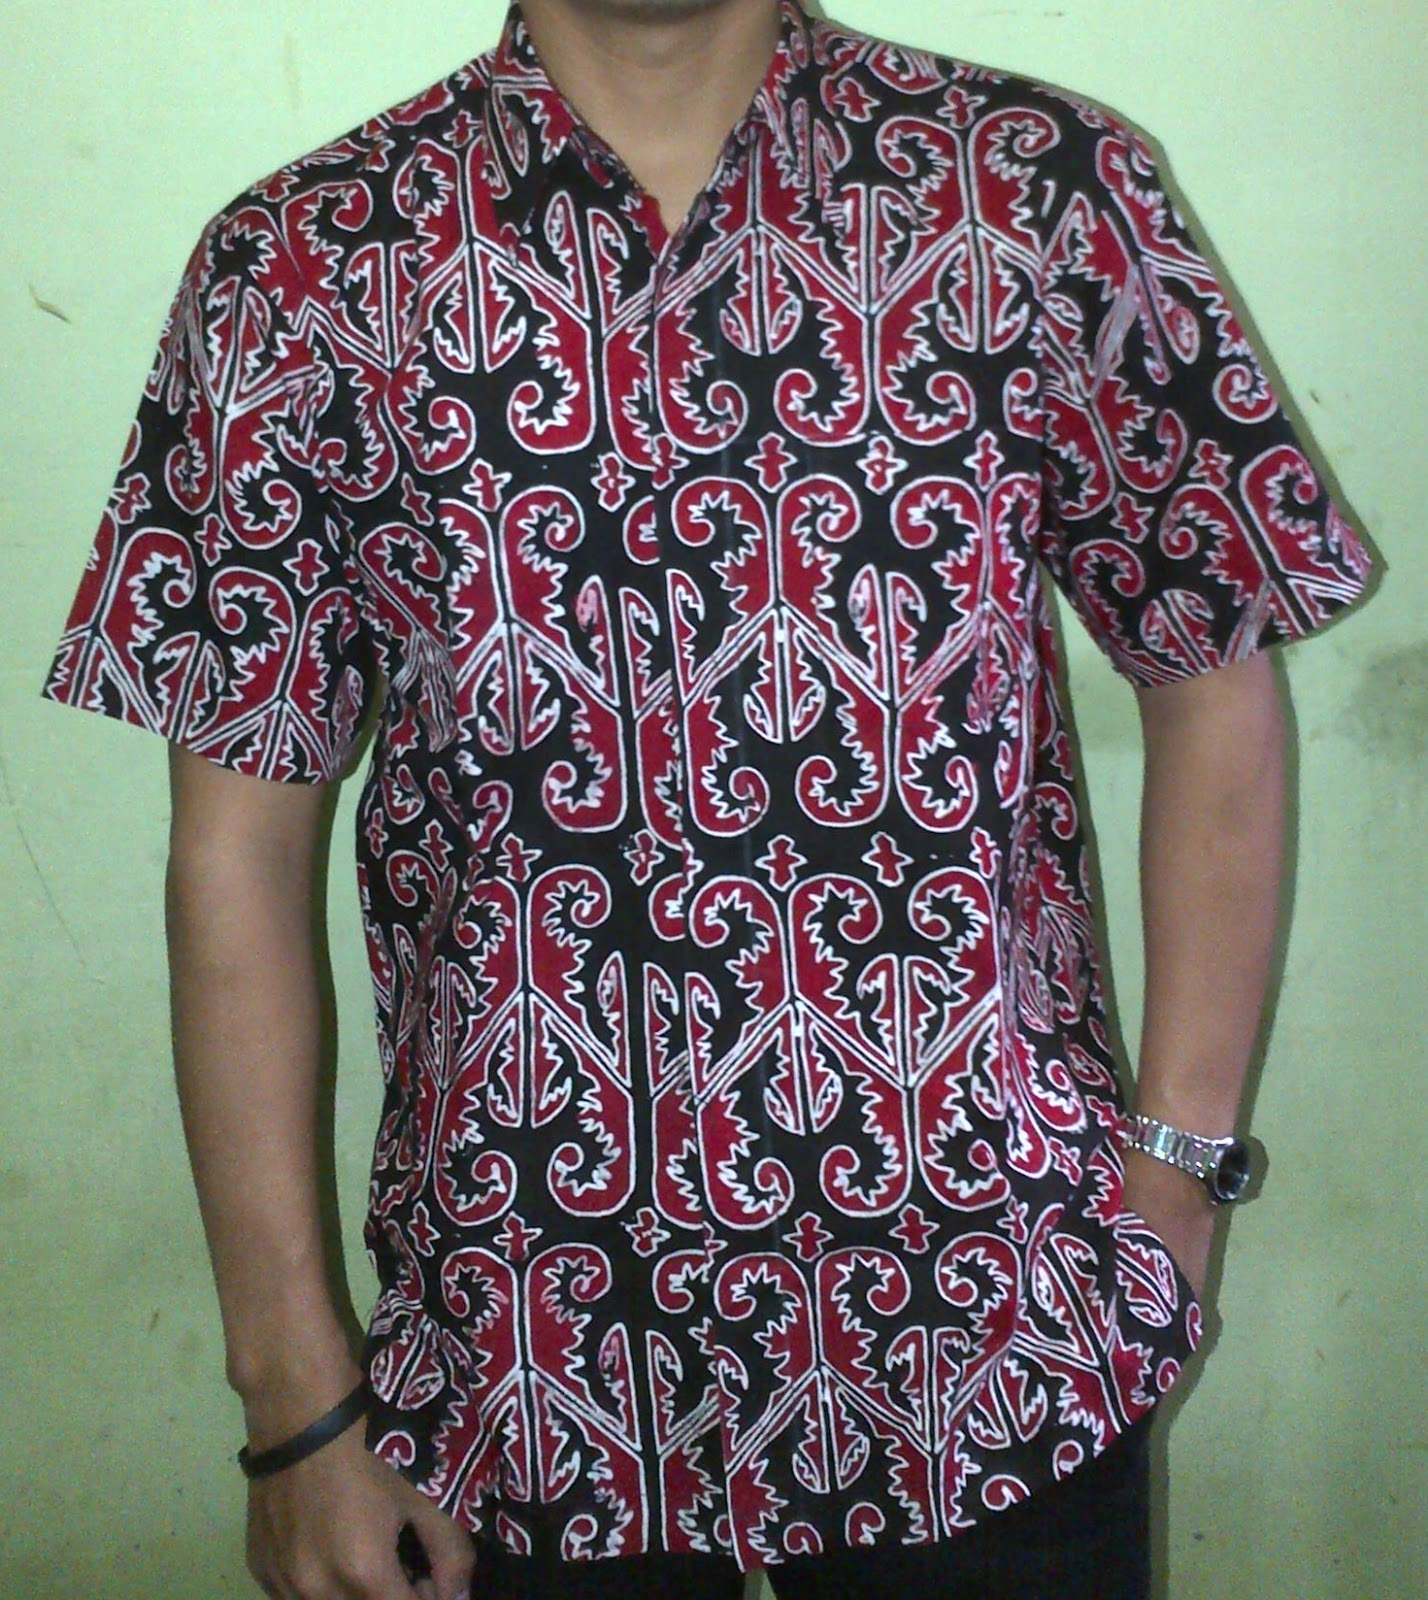 Kemeja Batik Gorga Simeol-meol IDR: 210rb, Bakal: 75rb/m